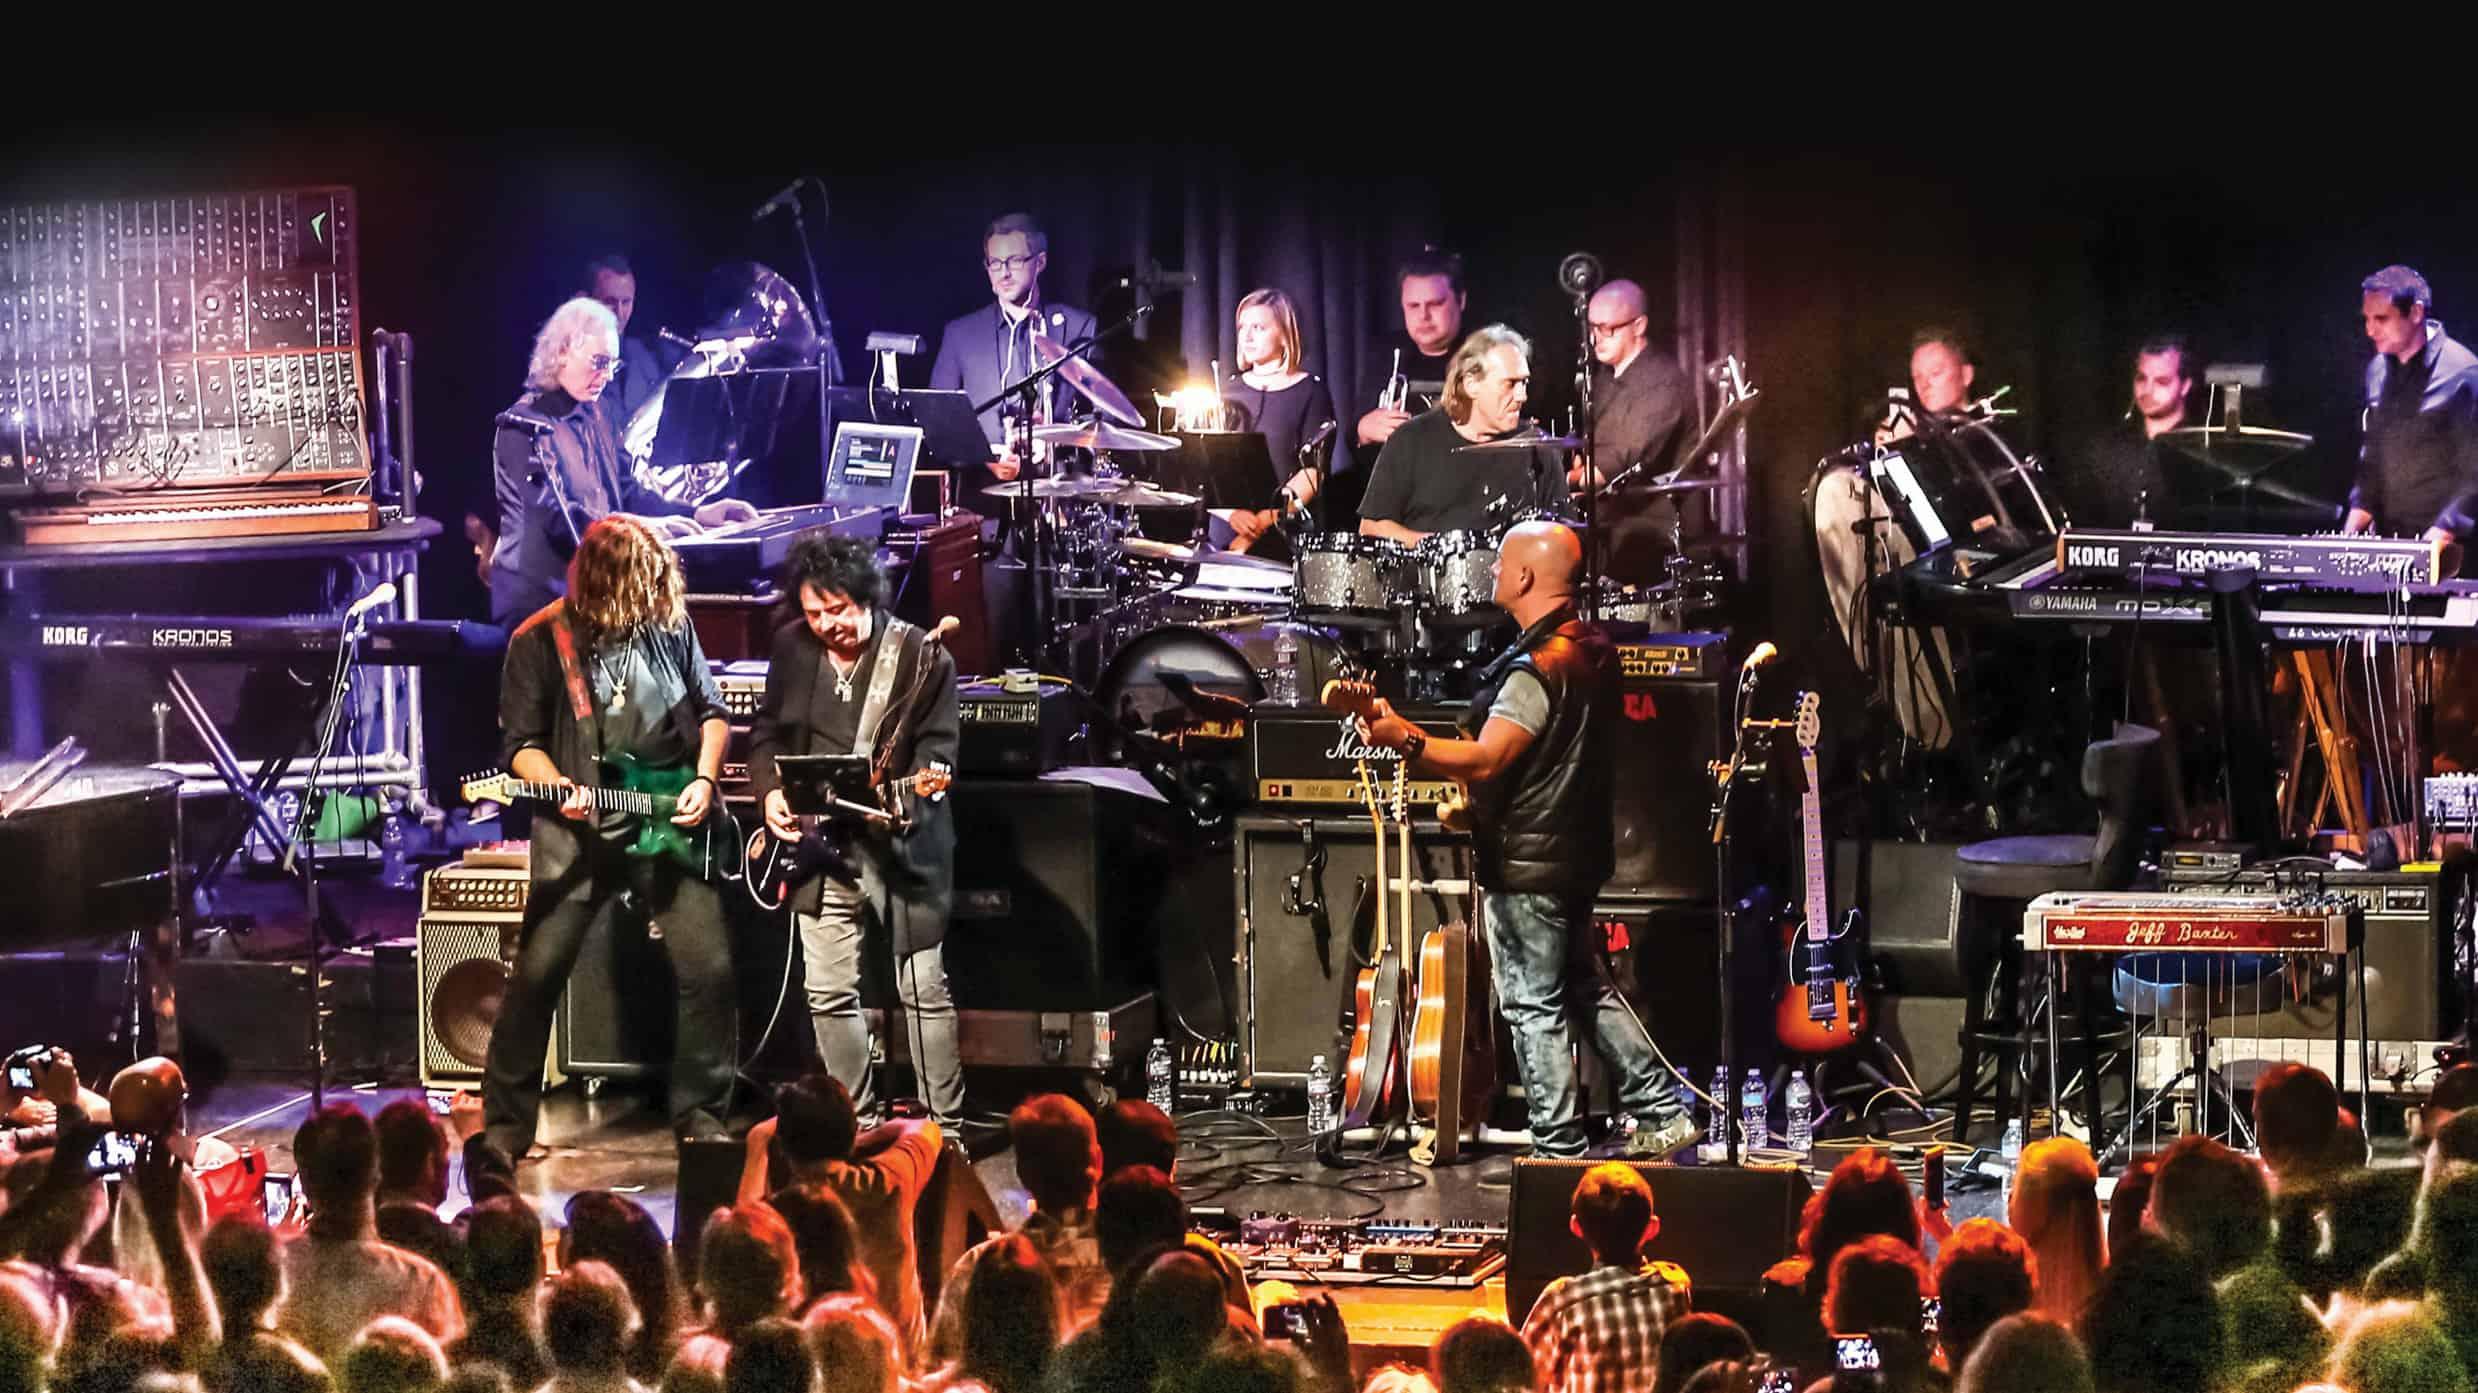 Keith Emerson Tribute